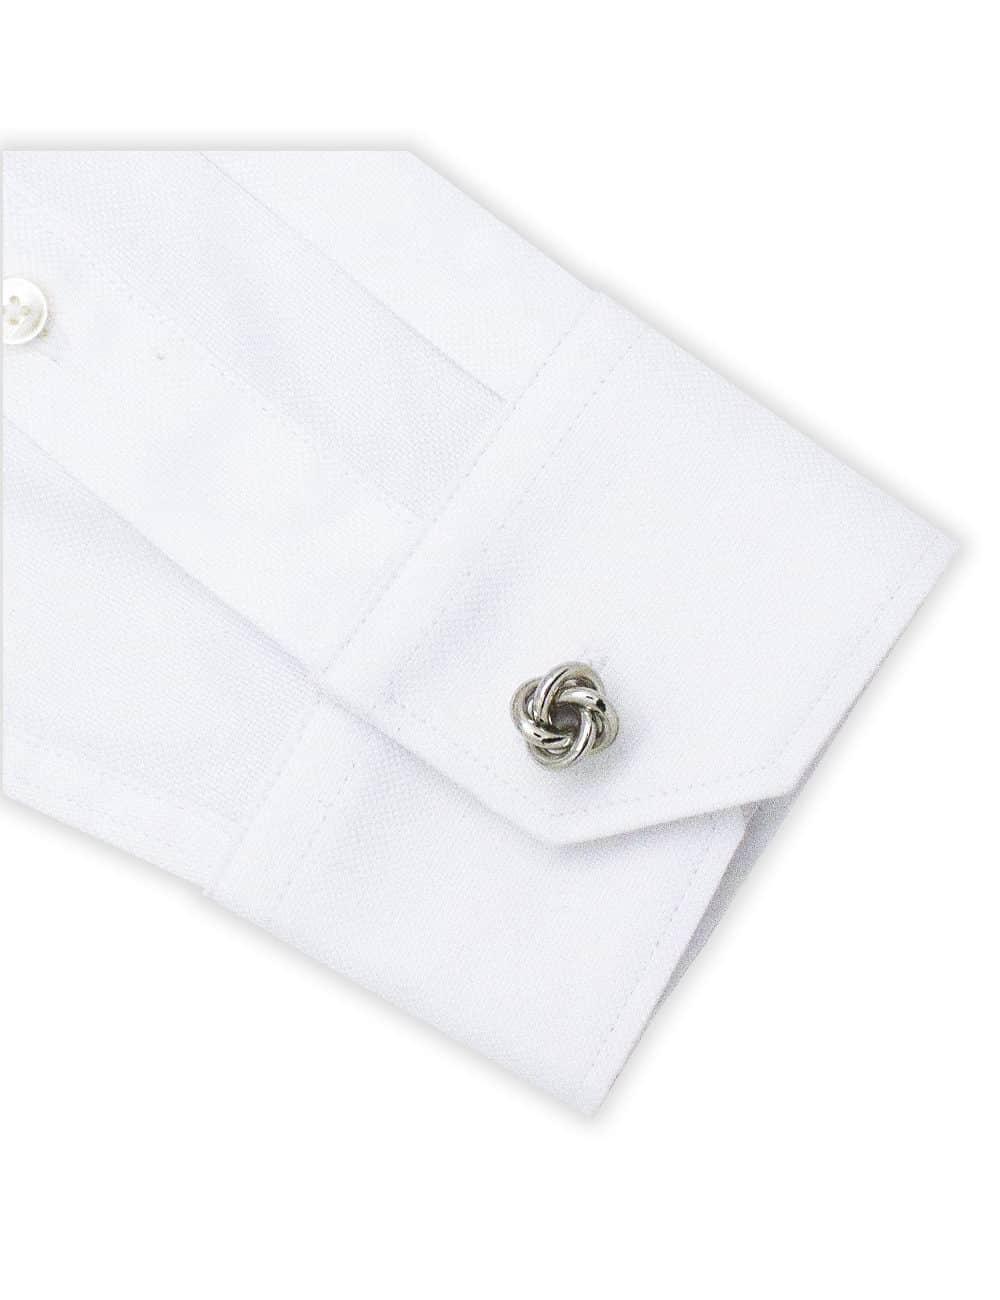 Classic Silver Loose Knot Cufflink C101FC-078